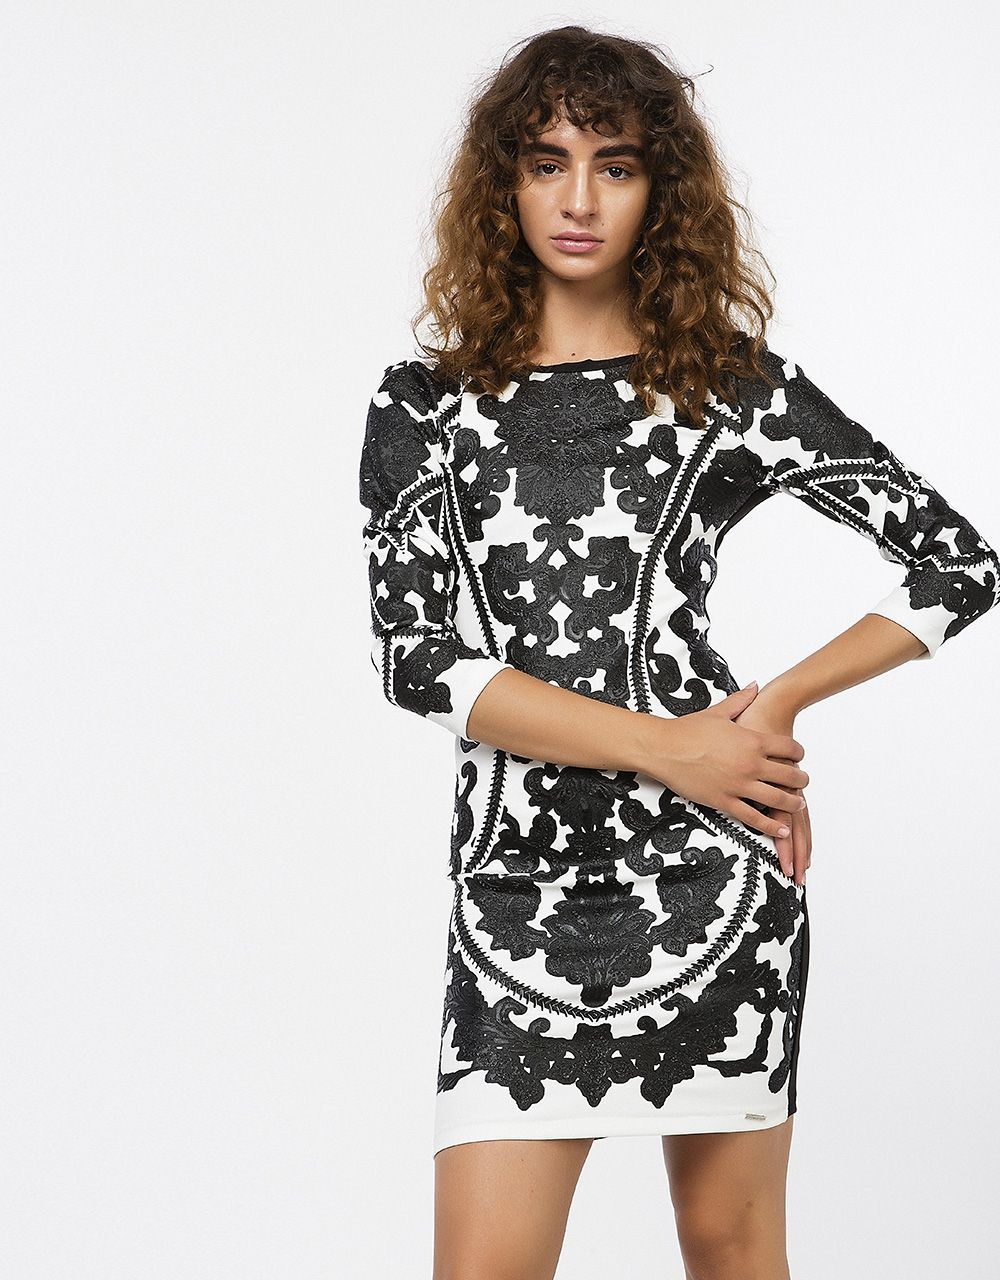 36a2a90f7f52 BSB 79.90€ - Εφαρμοστό φόρεμα με αποτύπωμα